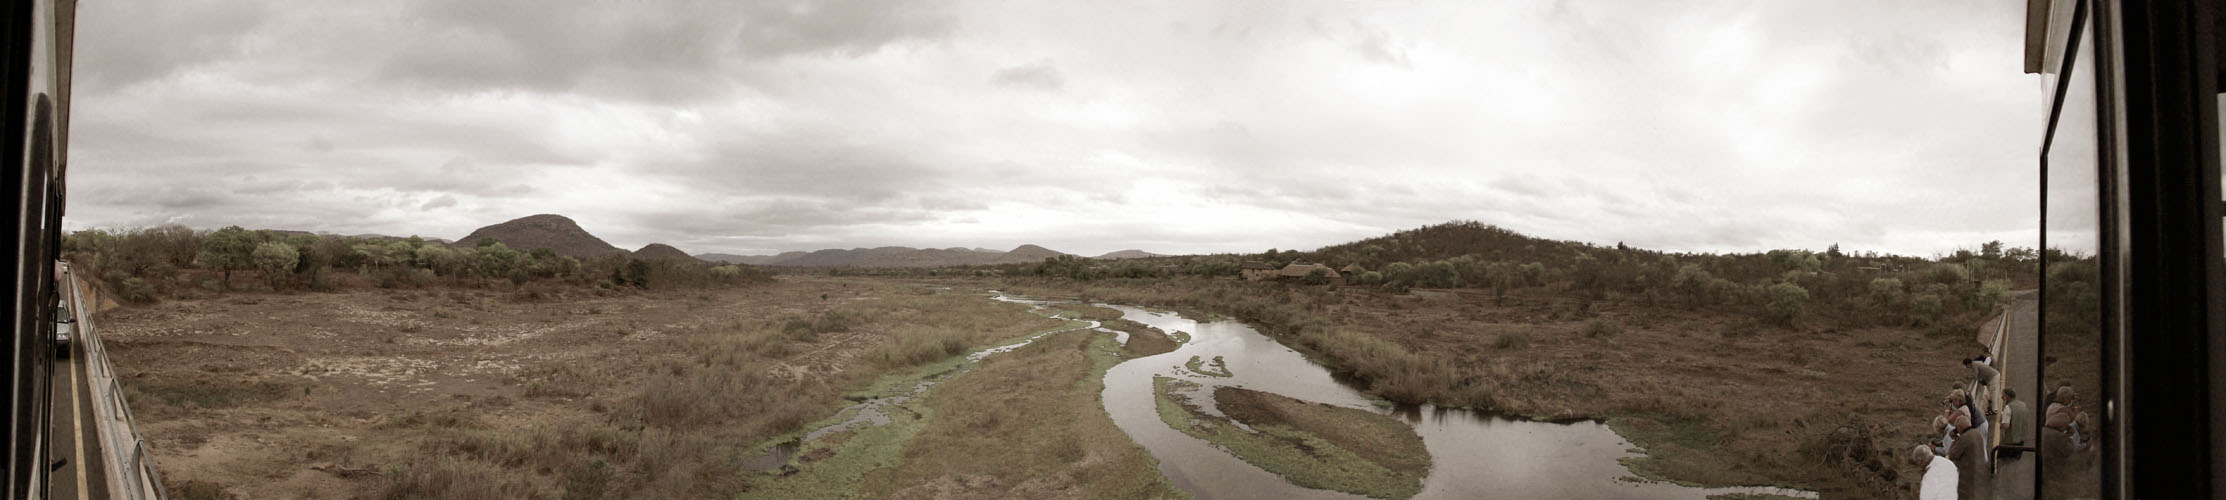 Kruger Park - Flußbett vor der Regenzeit